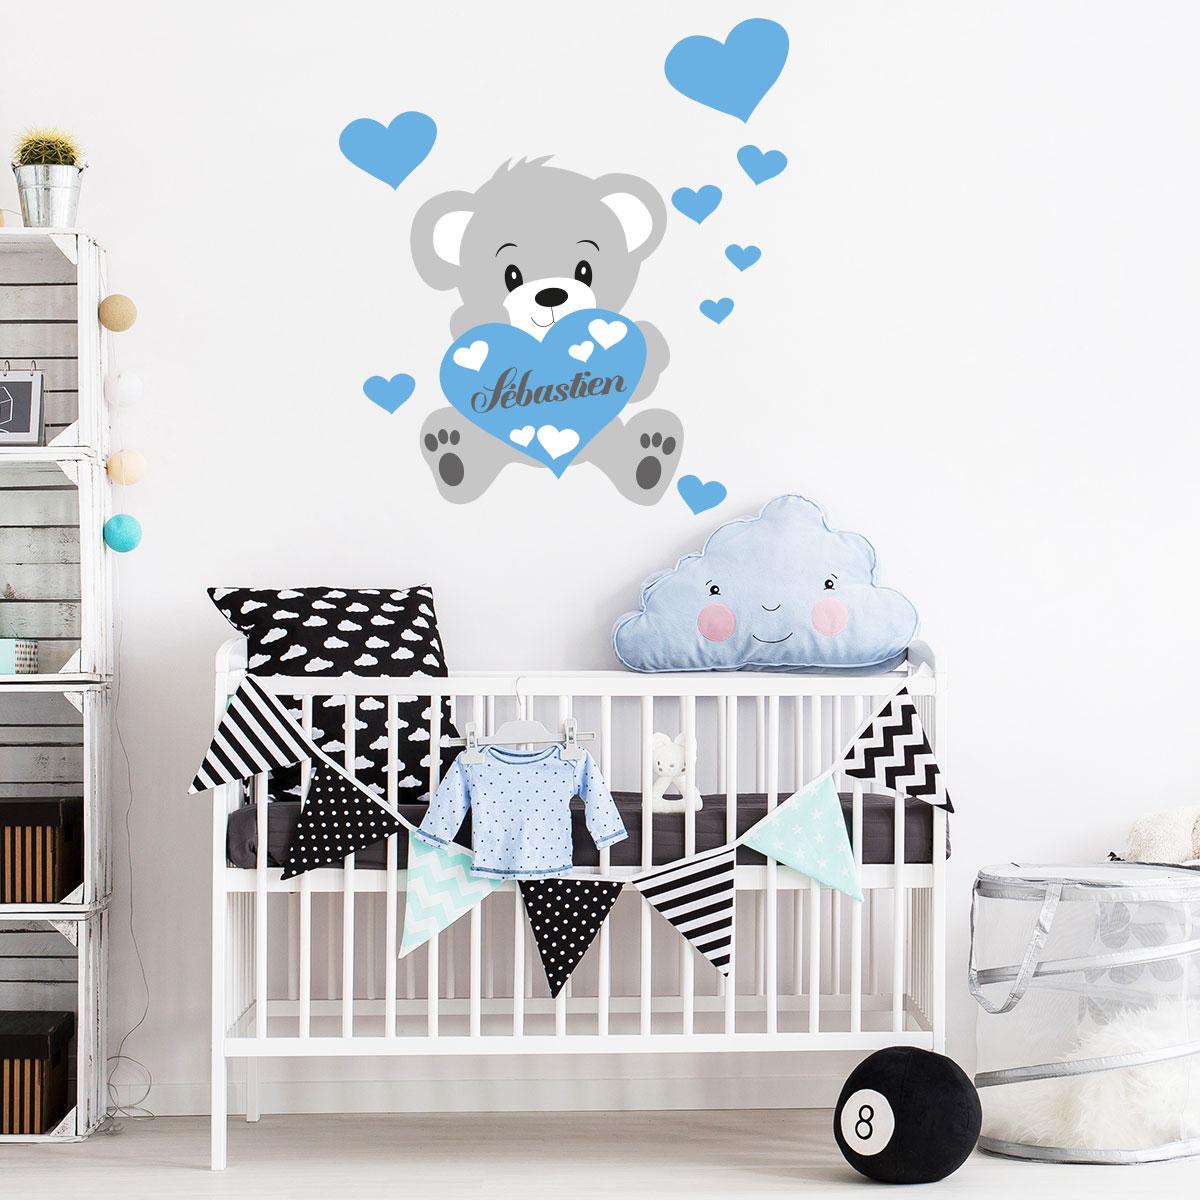 sticker pr nom personnalis ourson bleu stickers chambre. Black Bedroom Furniture Sets. Home Design Ideas